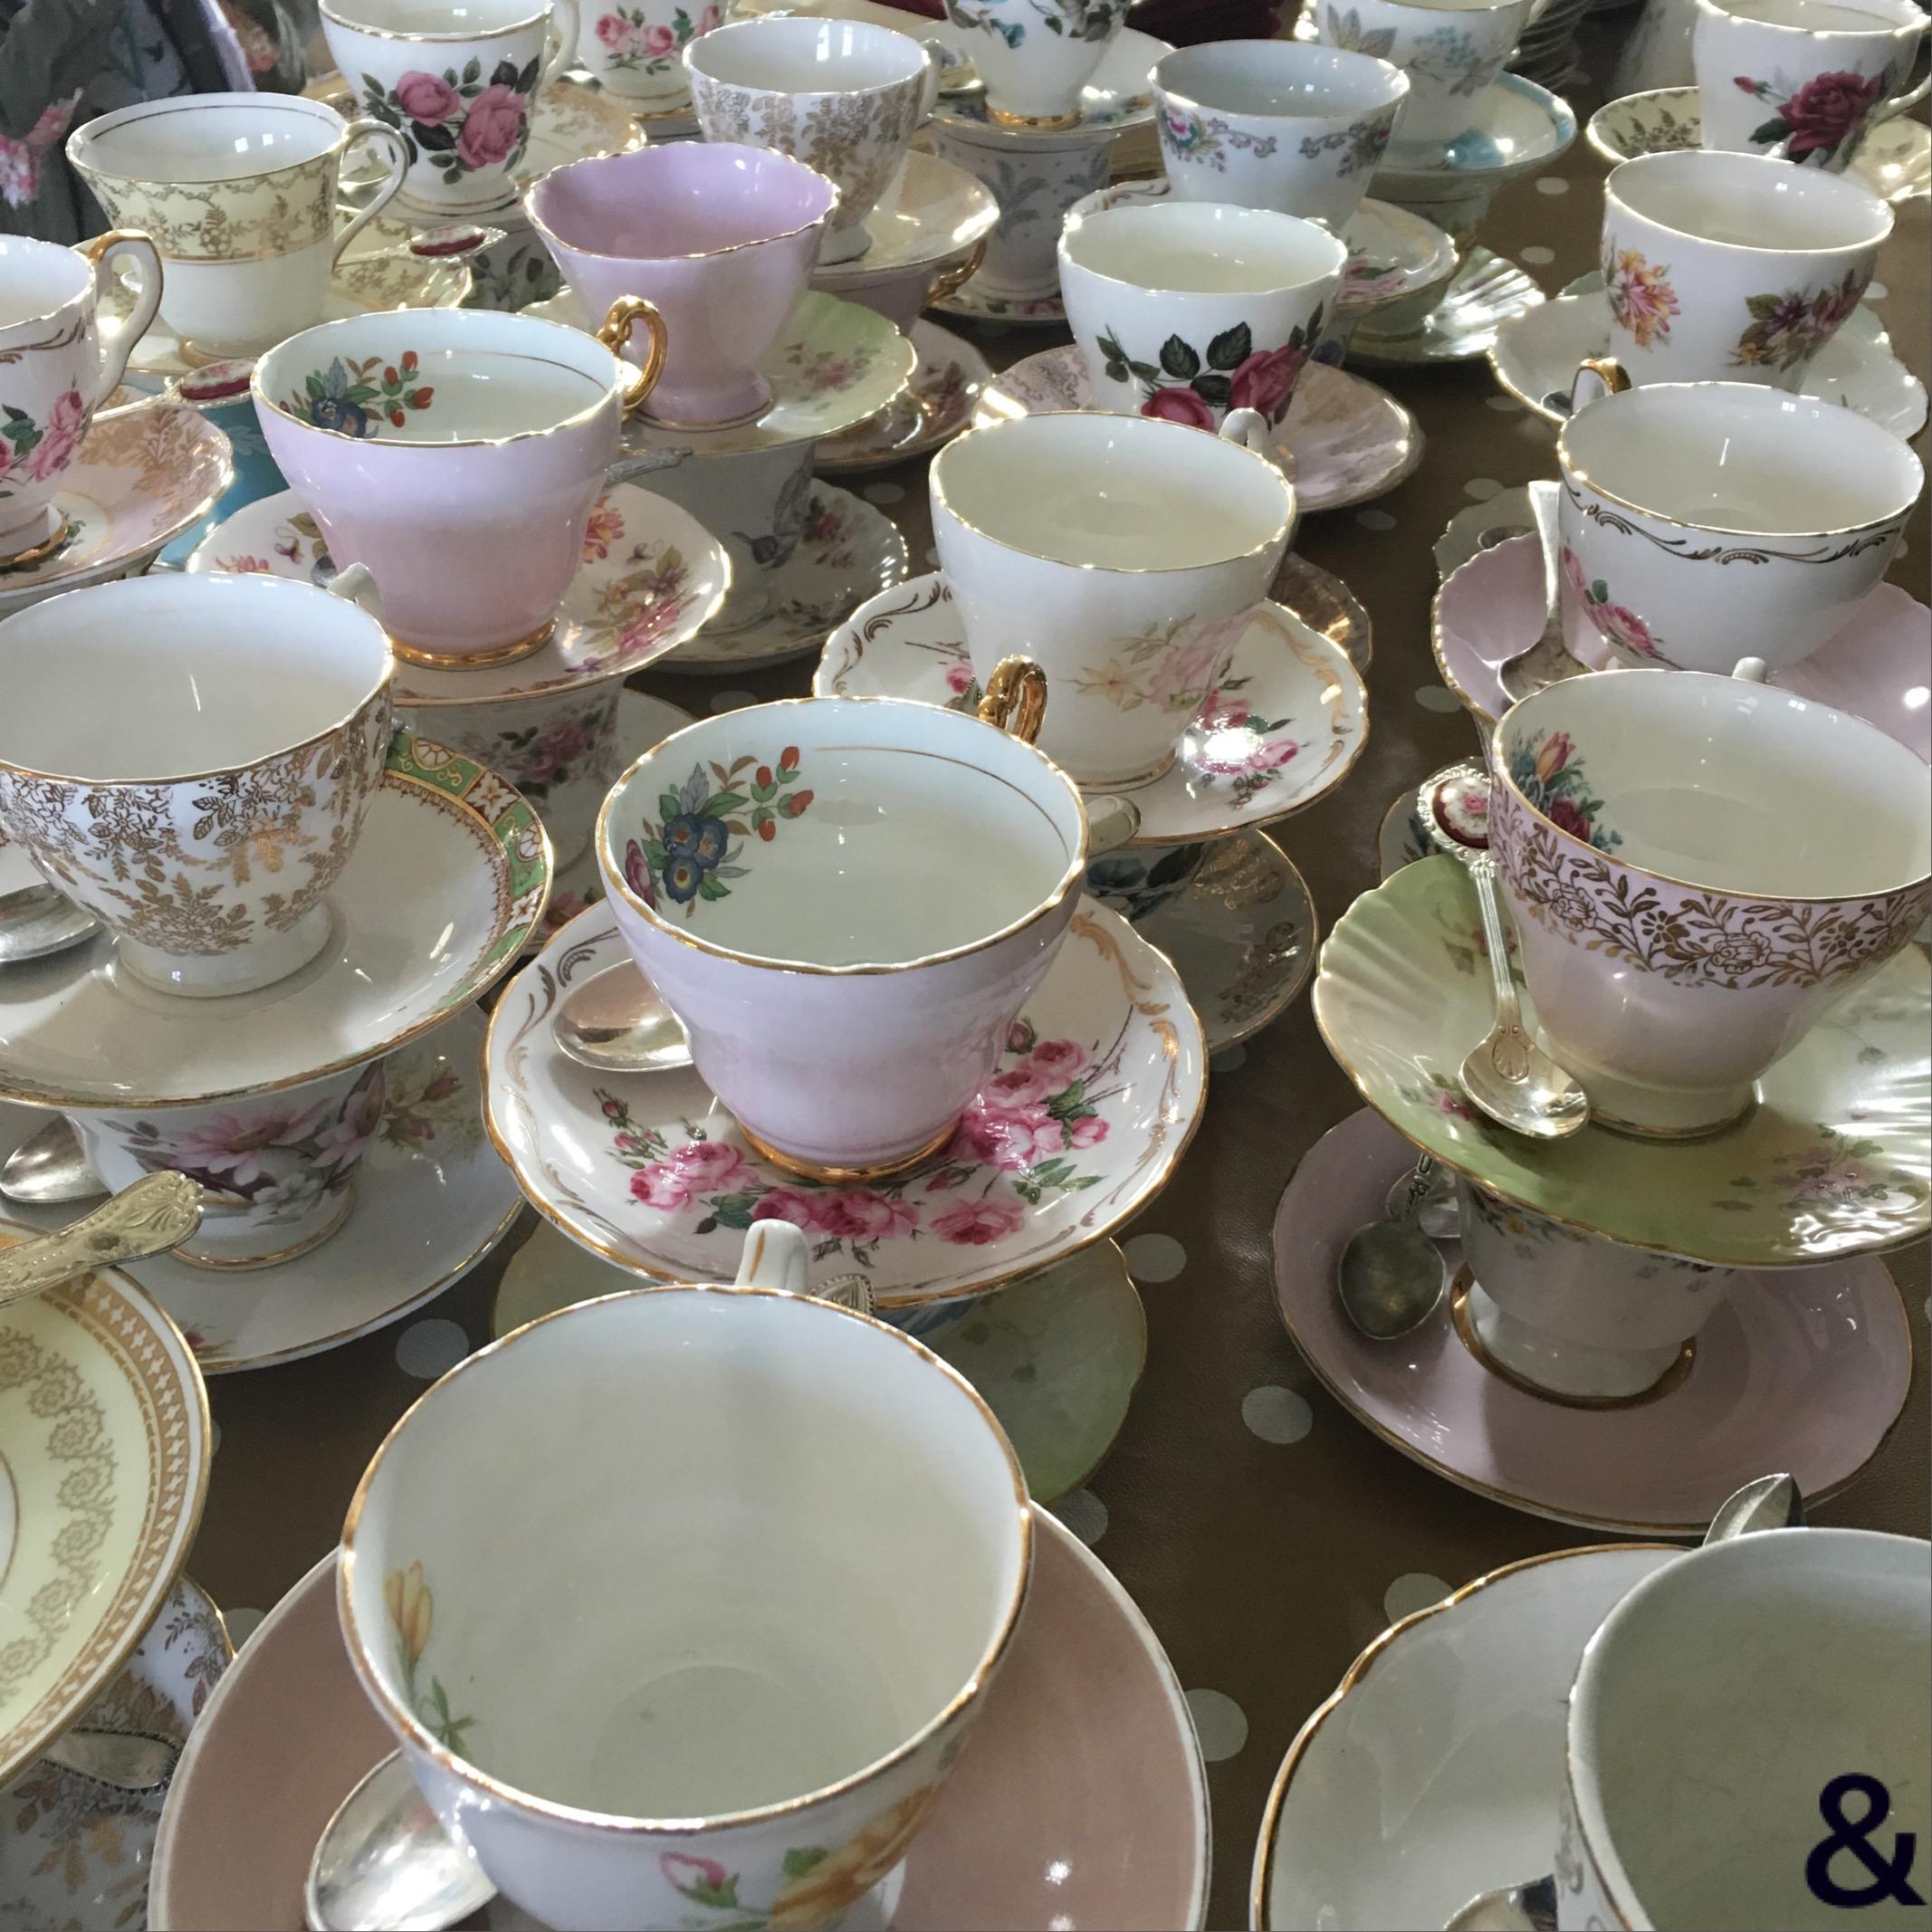 All we need is Tea